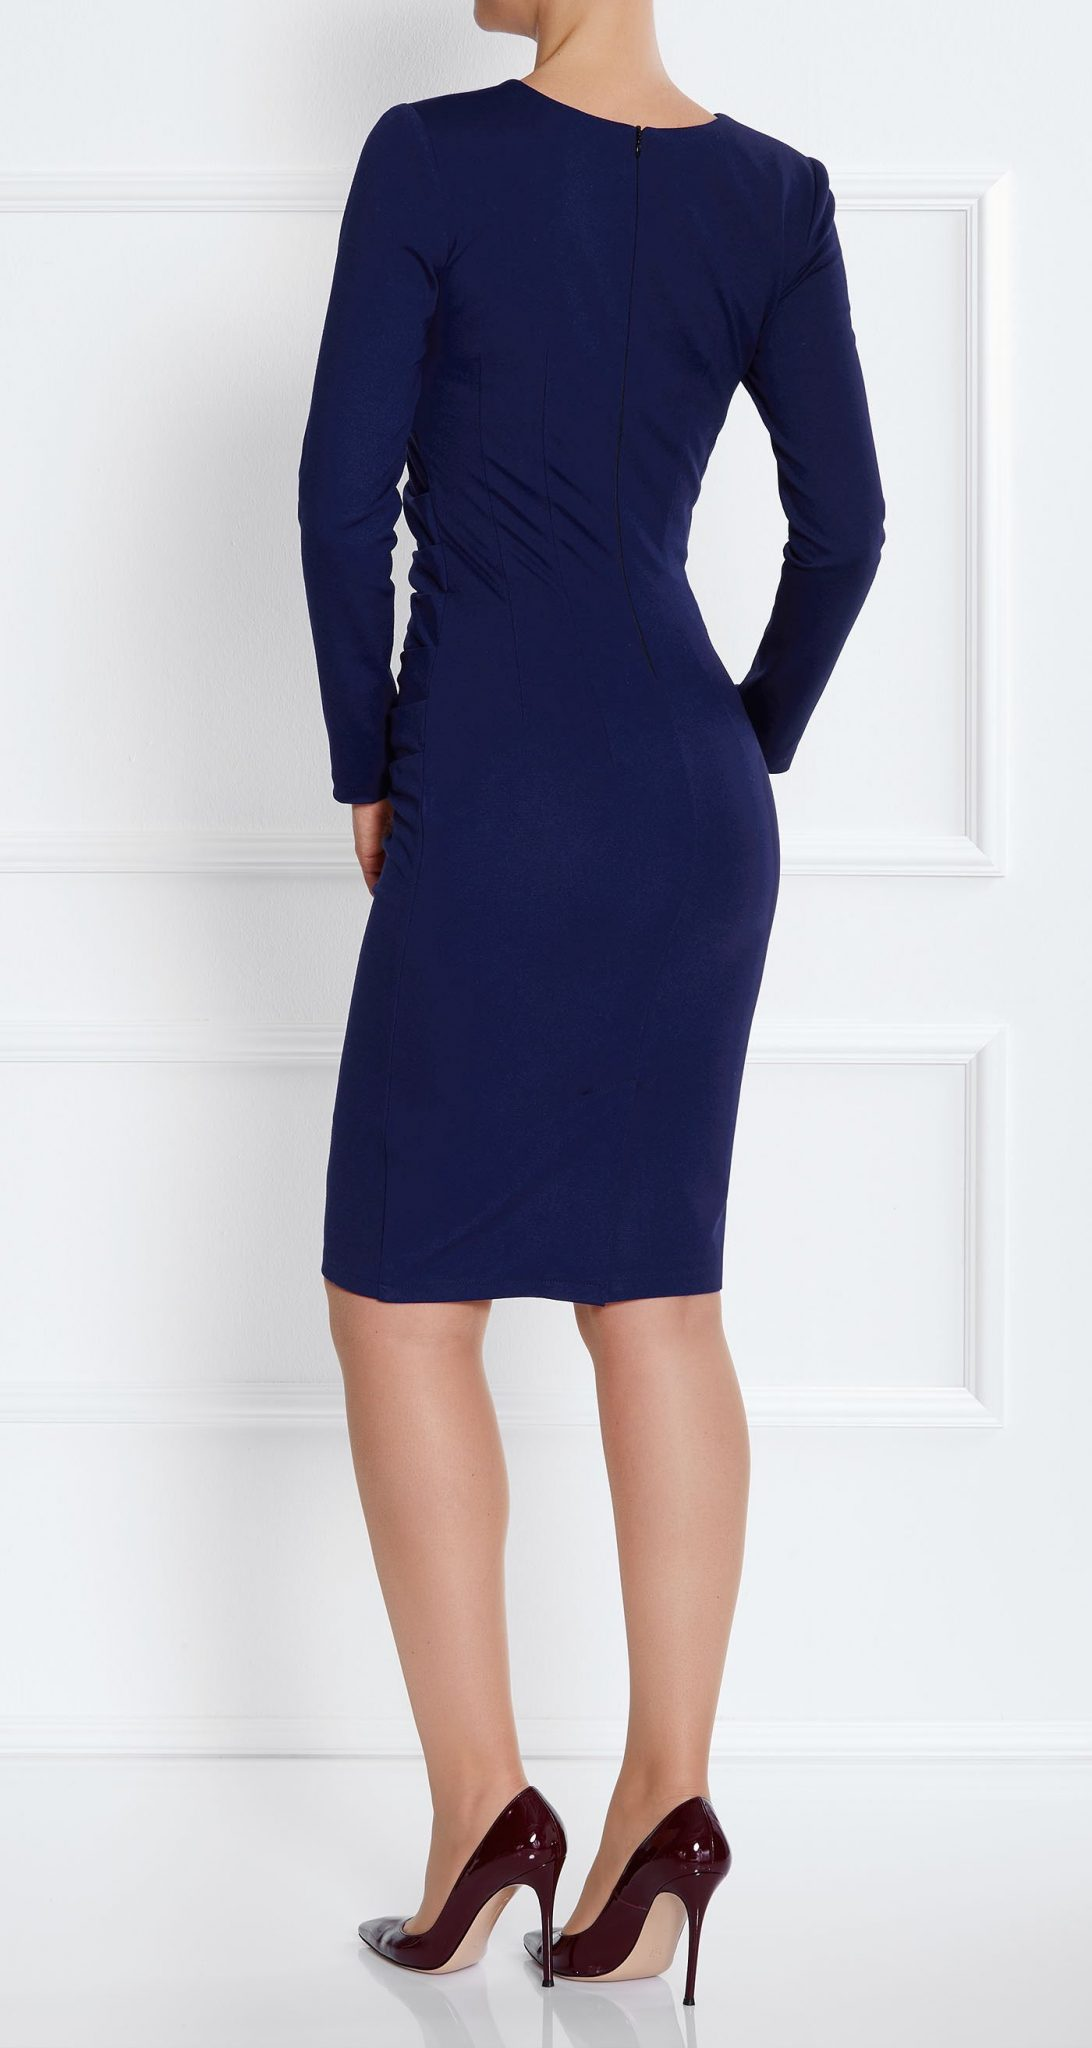 AMCO_fashion_Savanna_Dress_Night_Blue_C